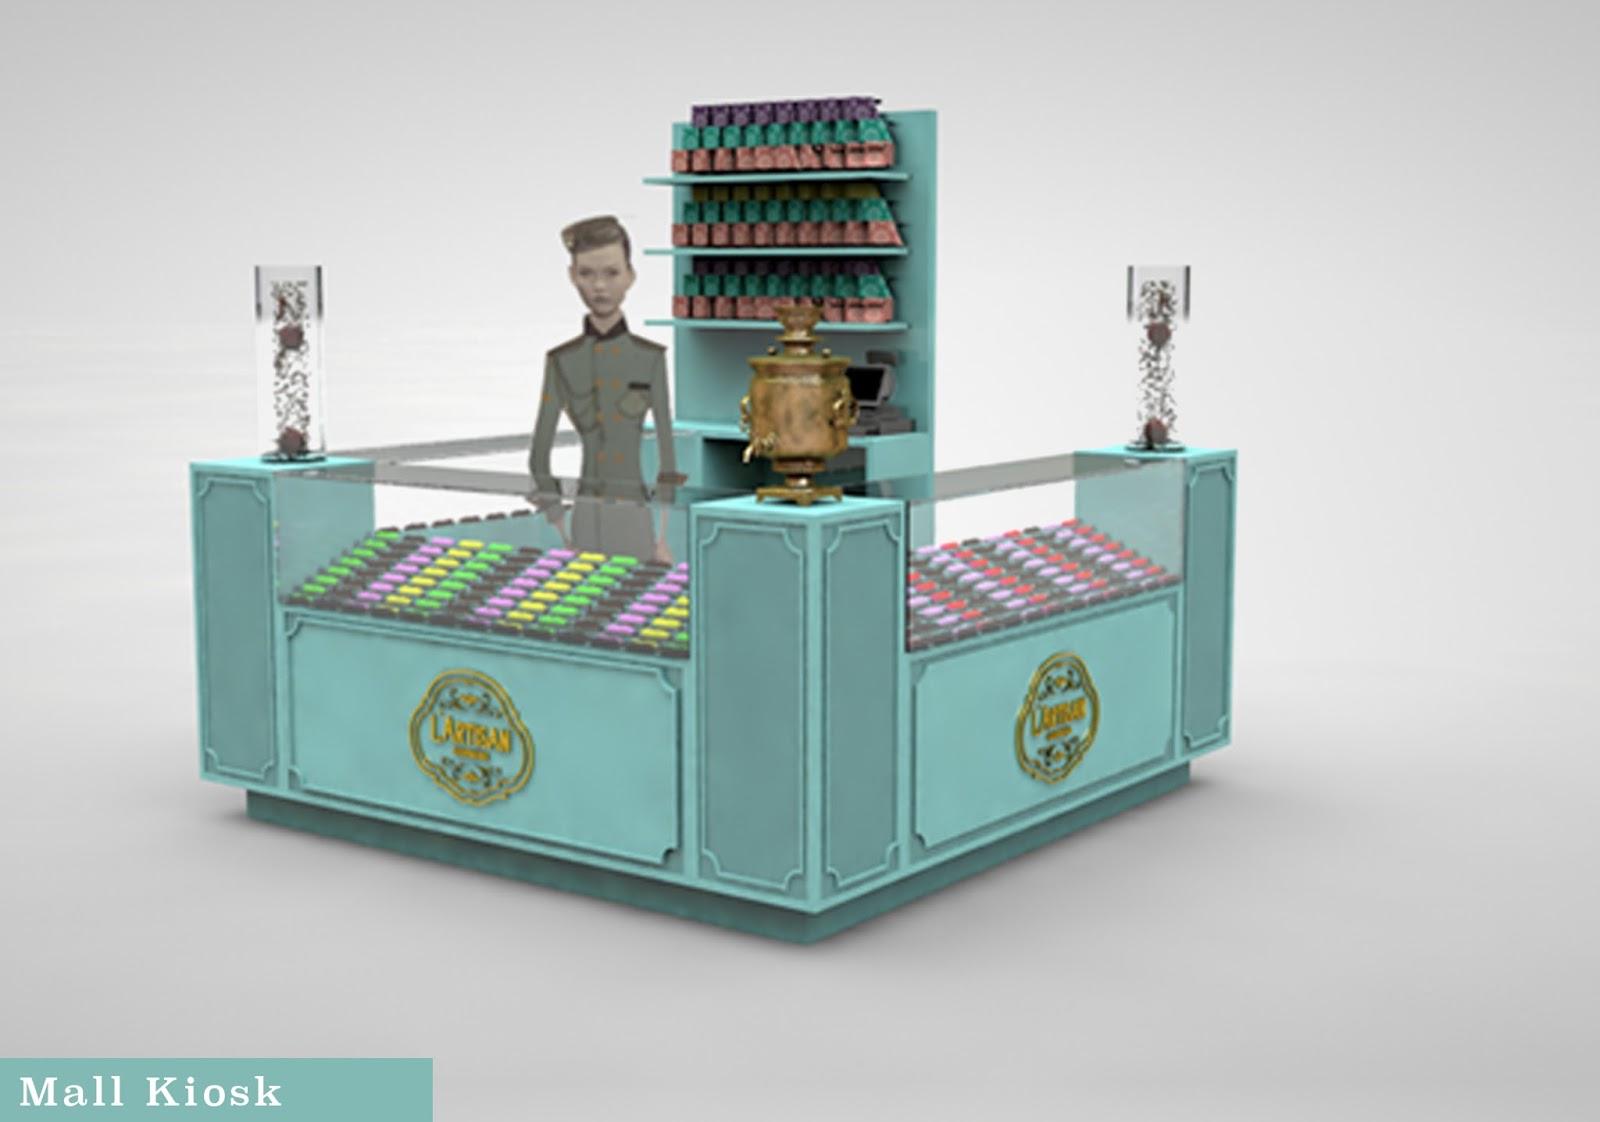 Candy Kiosk | Mall kiosk | Food Kiosk Manufacturer Ands Supplier In uae